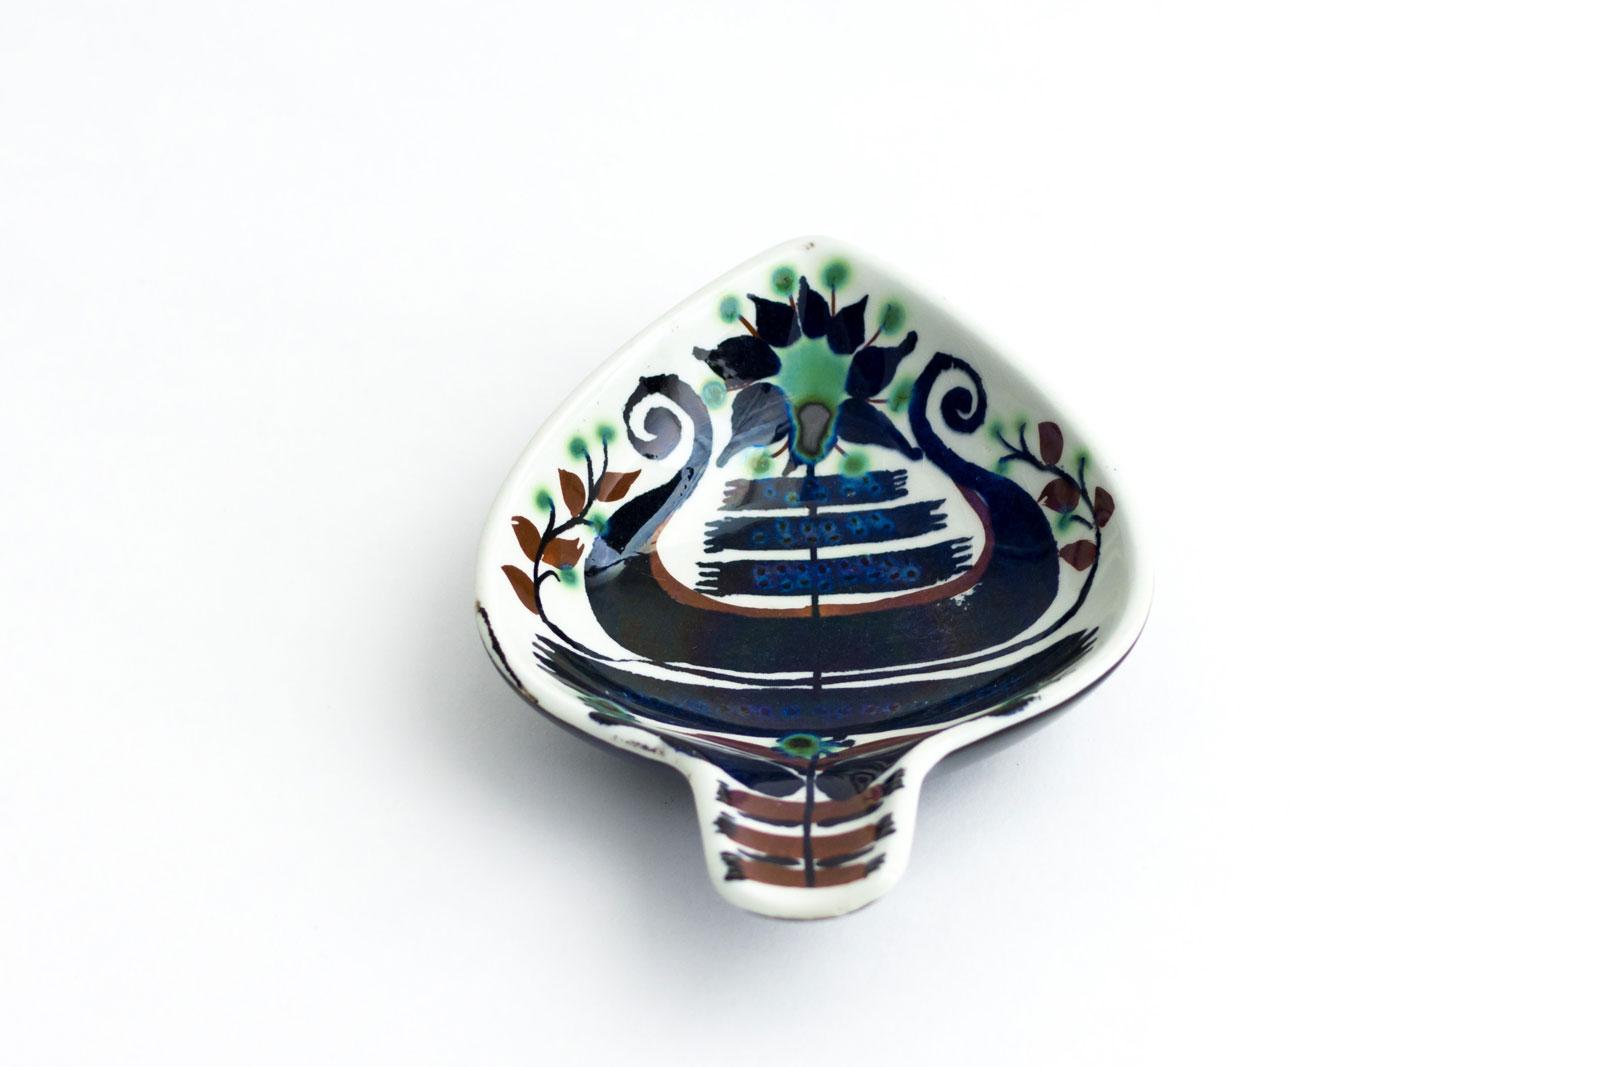 Pipe Holder designed by Marianne Johnson